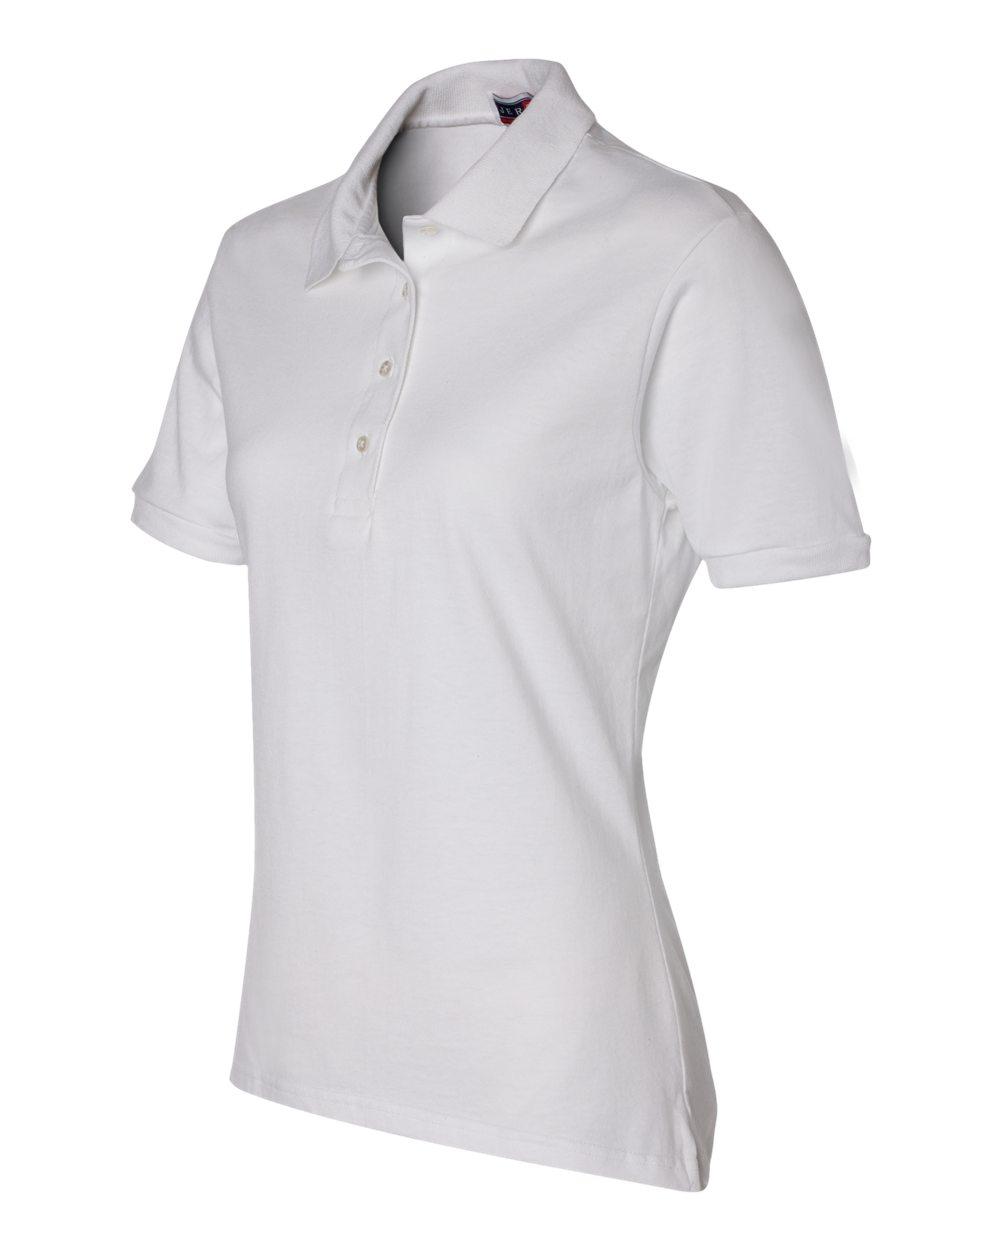 Jerzees-Womens-5-6-oz-50-50-Jersey-Polo-with-Spot-Shield-437W-Size-S-2XL thumbnail 59